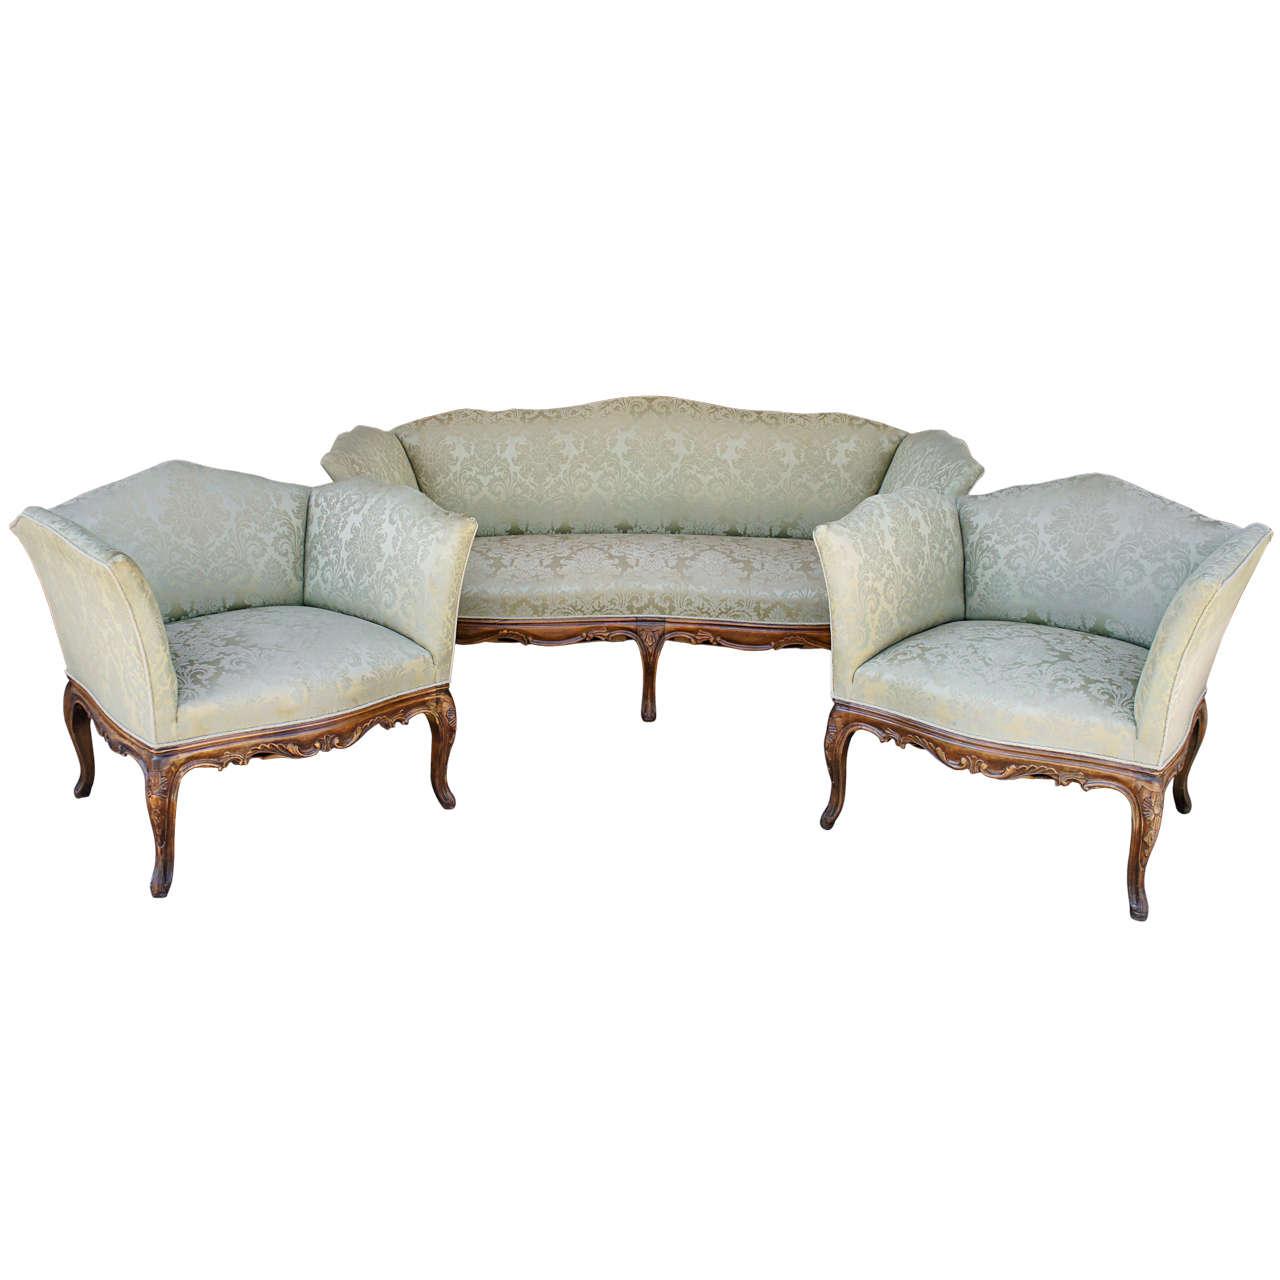 french provincial sofa salon set at 1stdibs